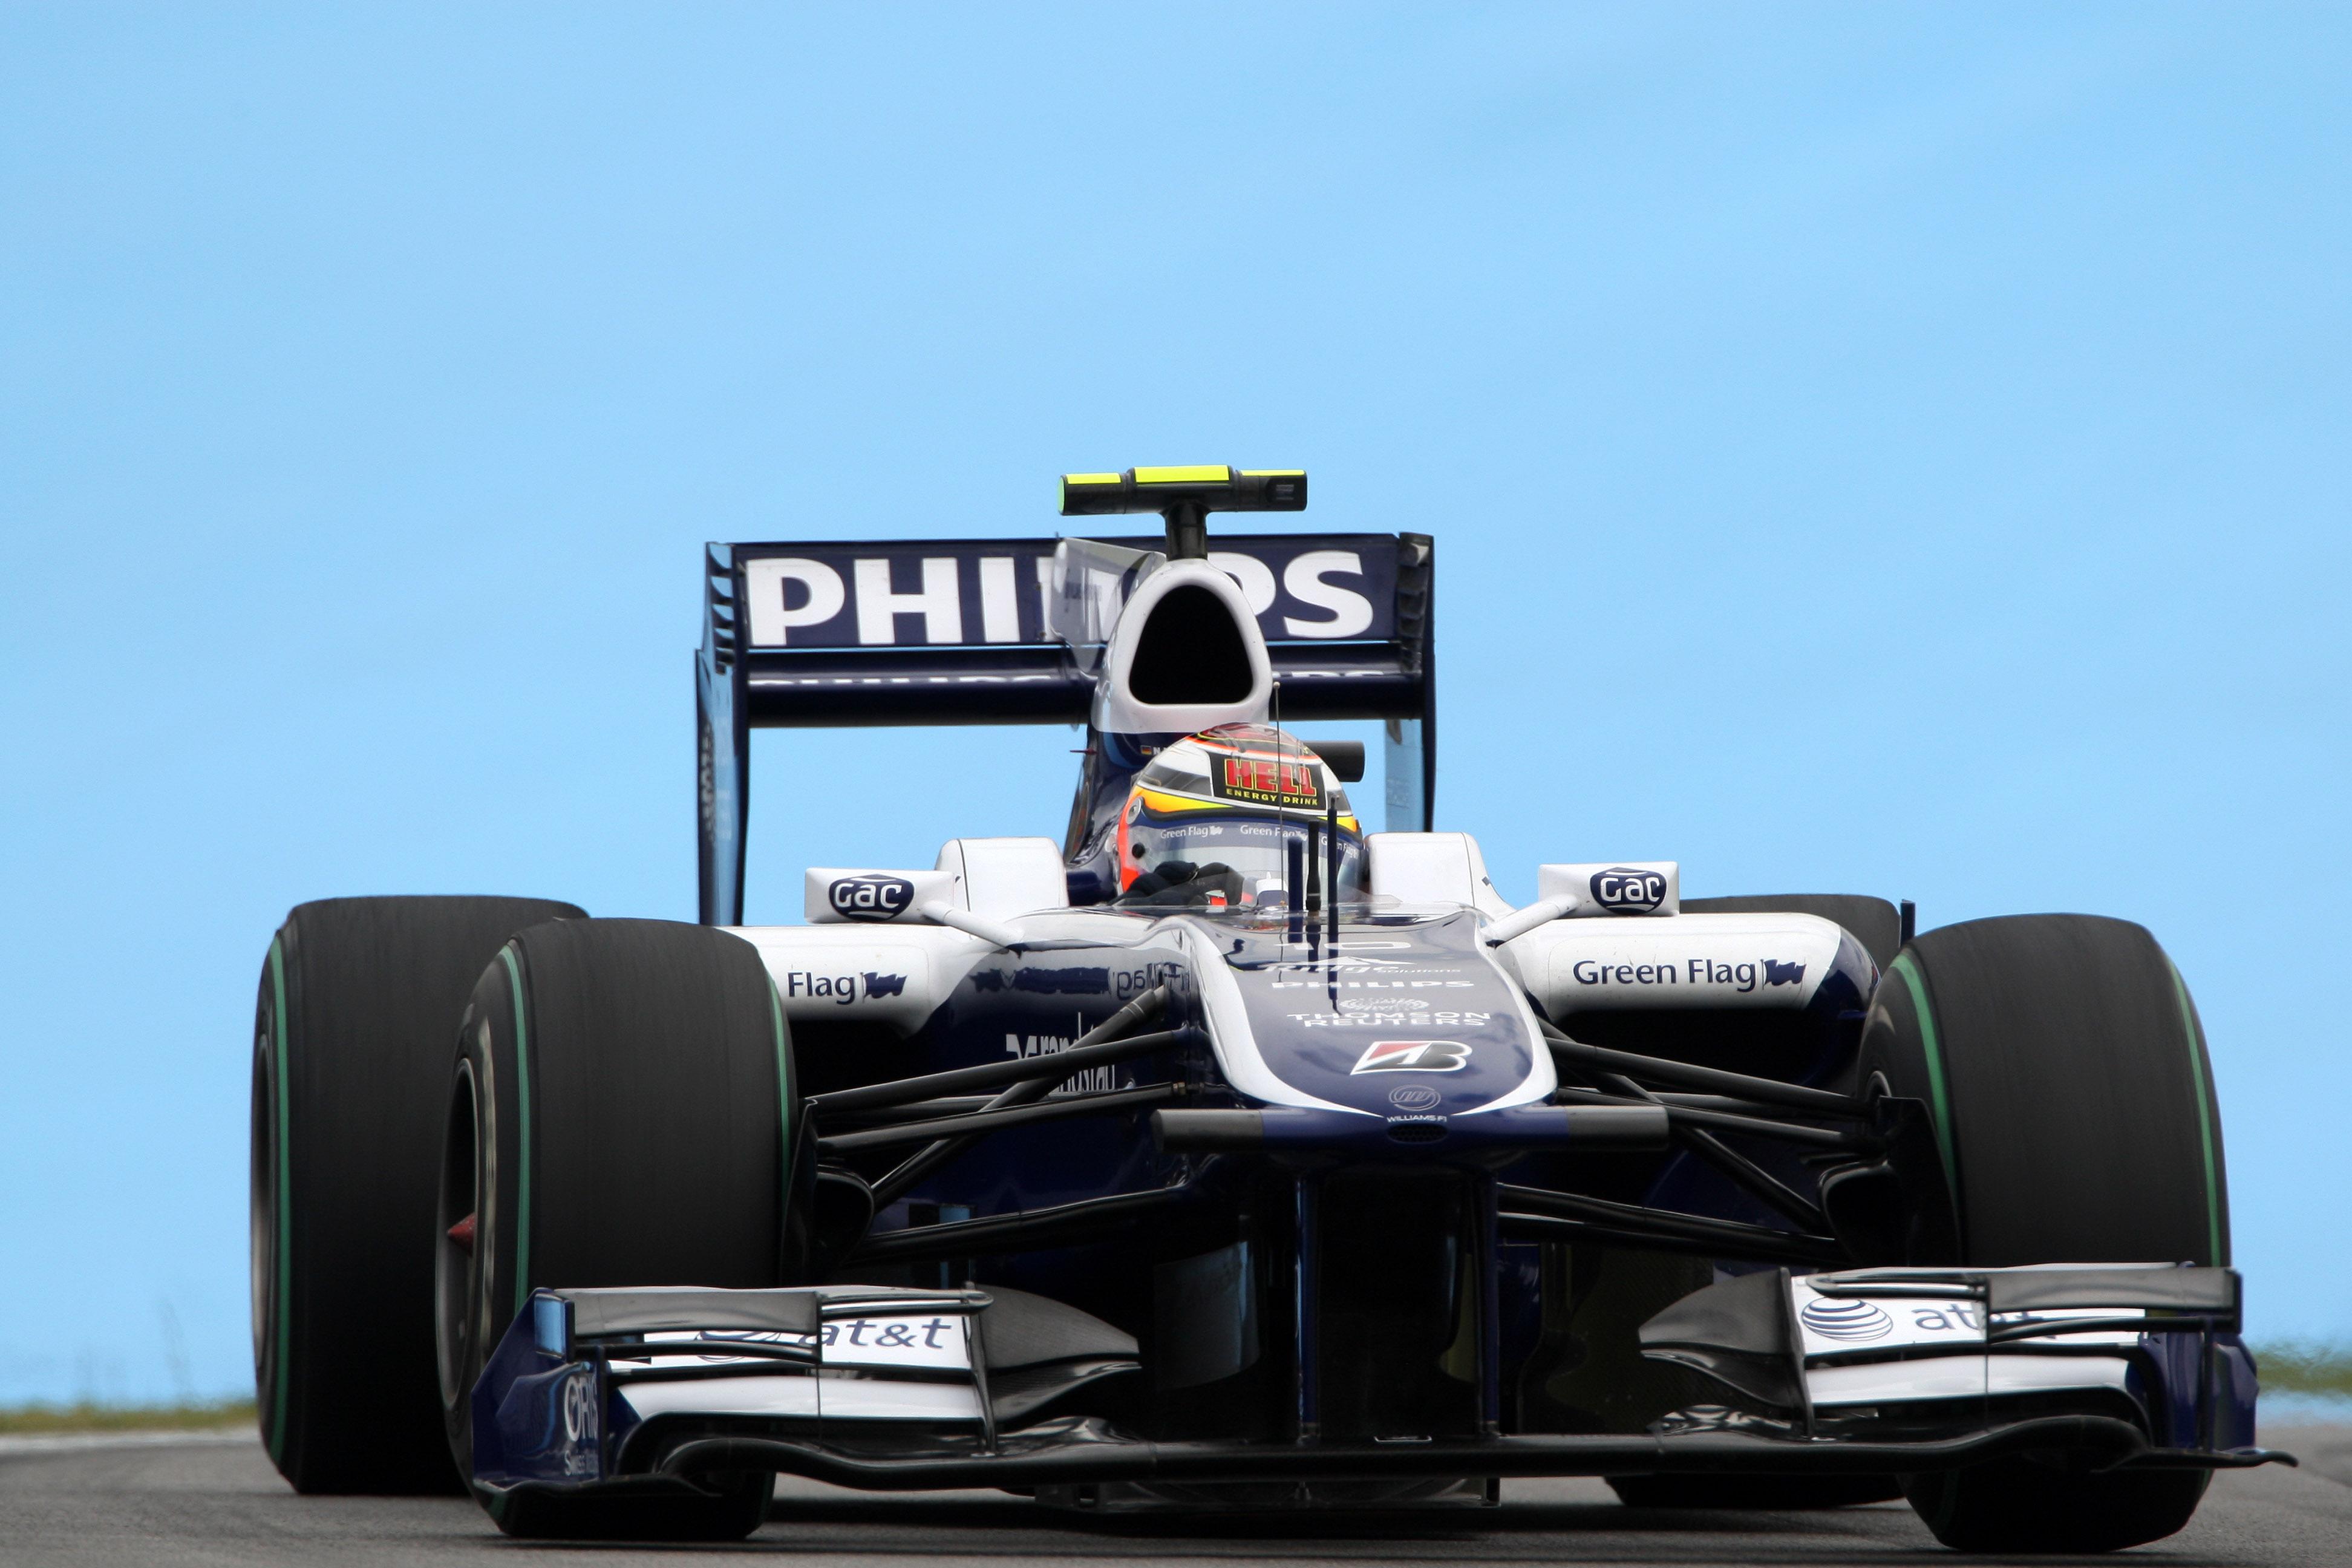 Nico Hulkenberg Williams Brazil pole position F1 2010 Interlagos